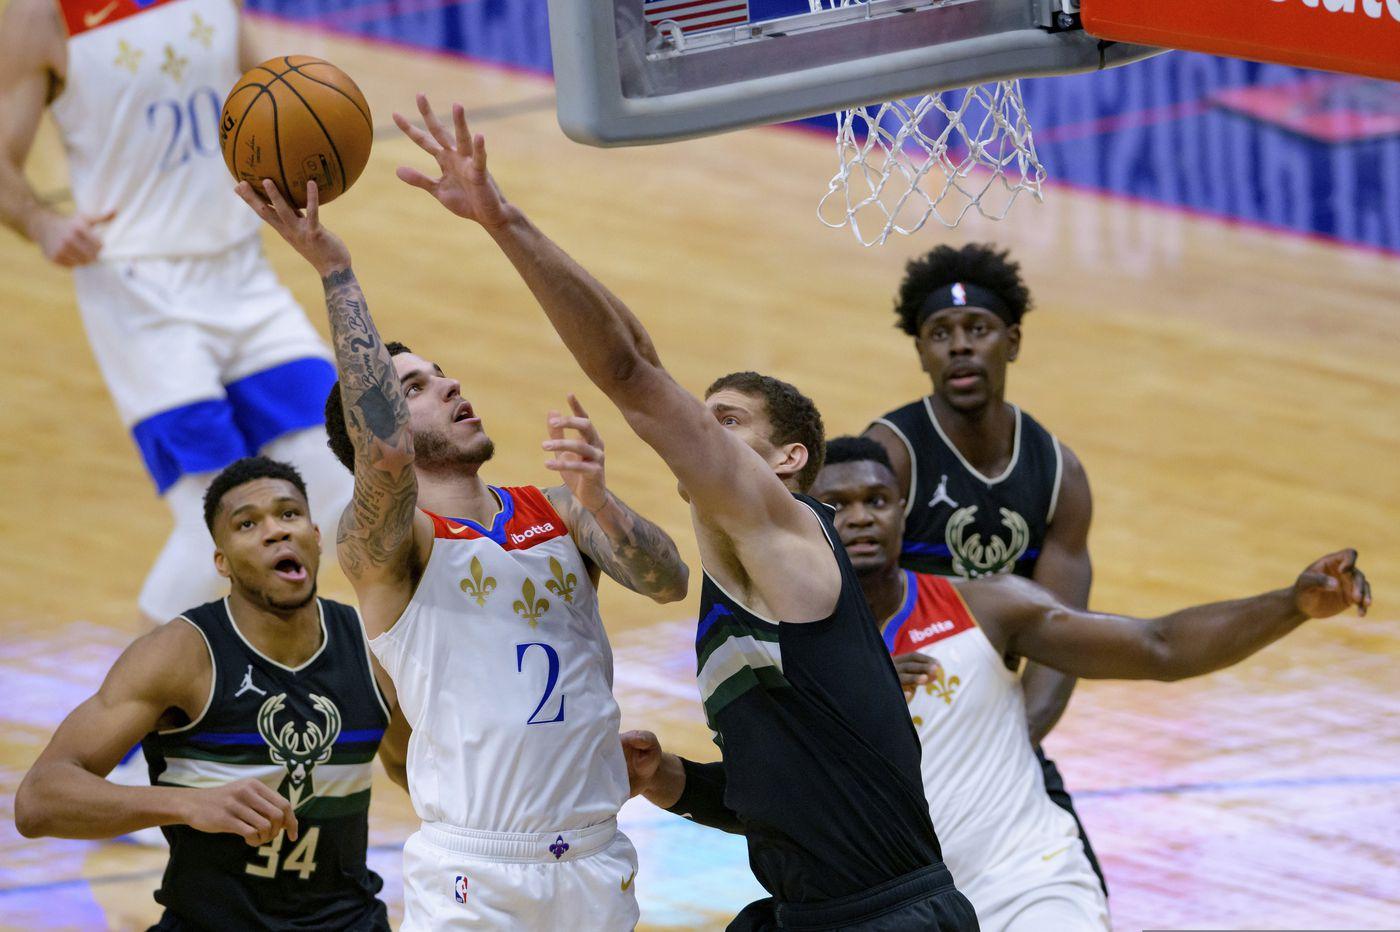 Ingram, Ball lead Pelicans past Bucks, 131-126